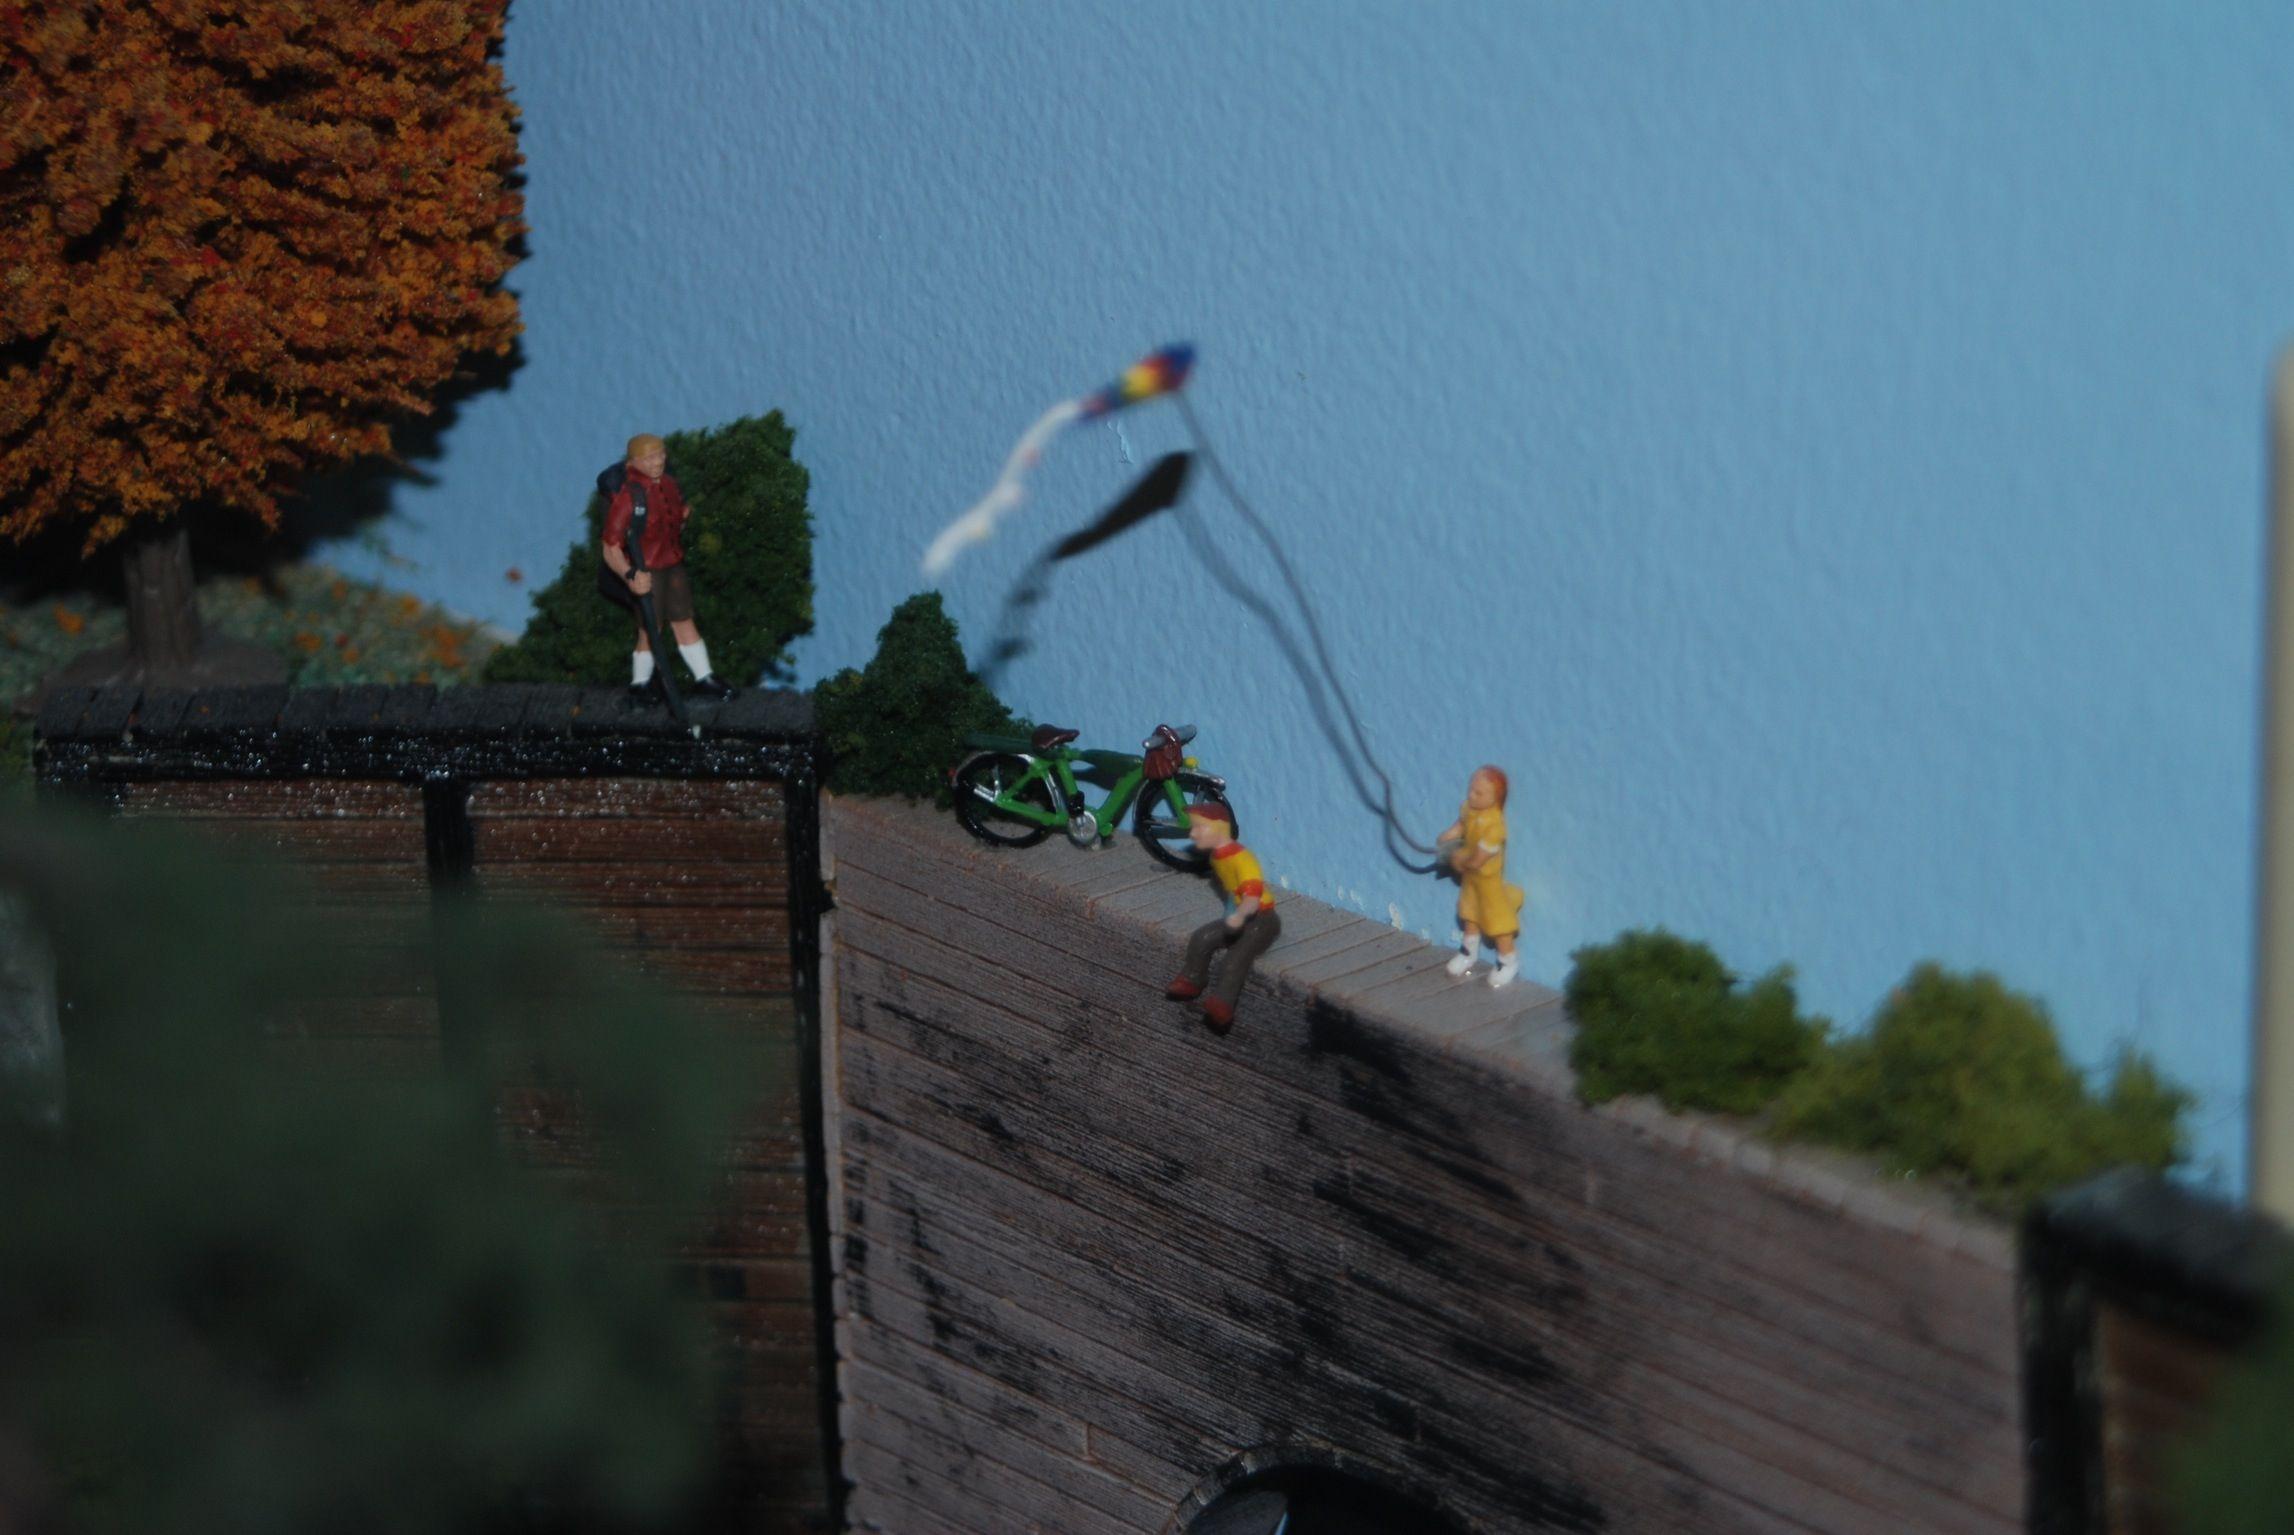 Her kite is doing good :)